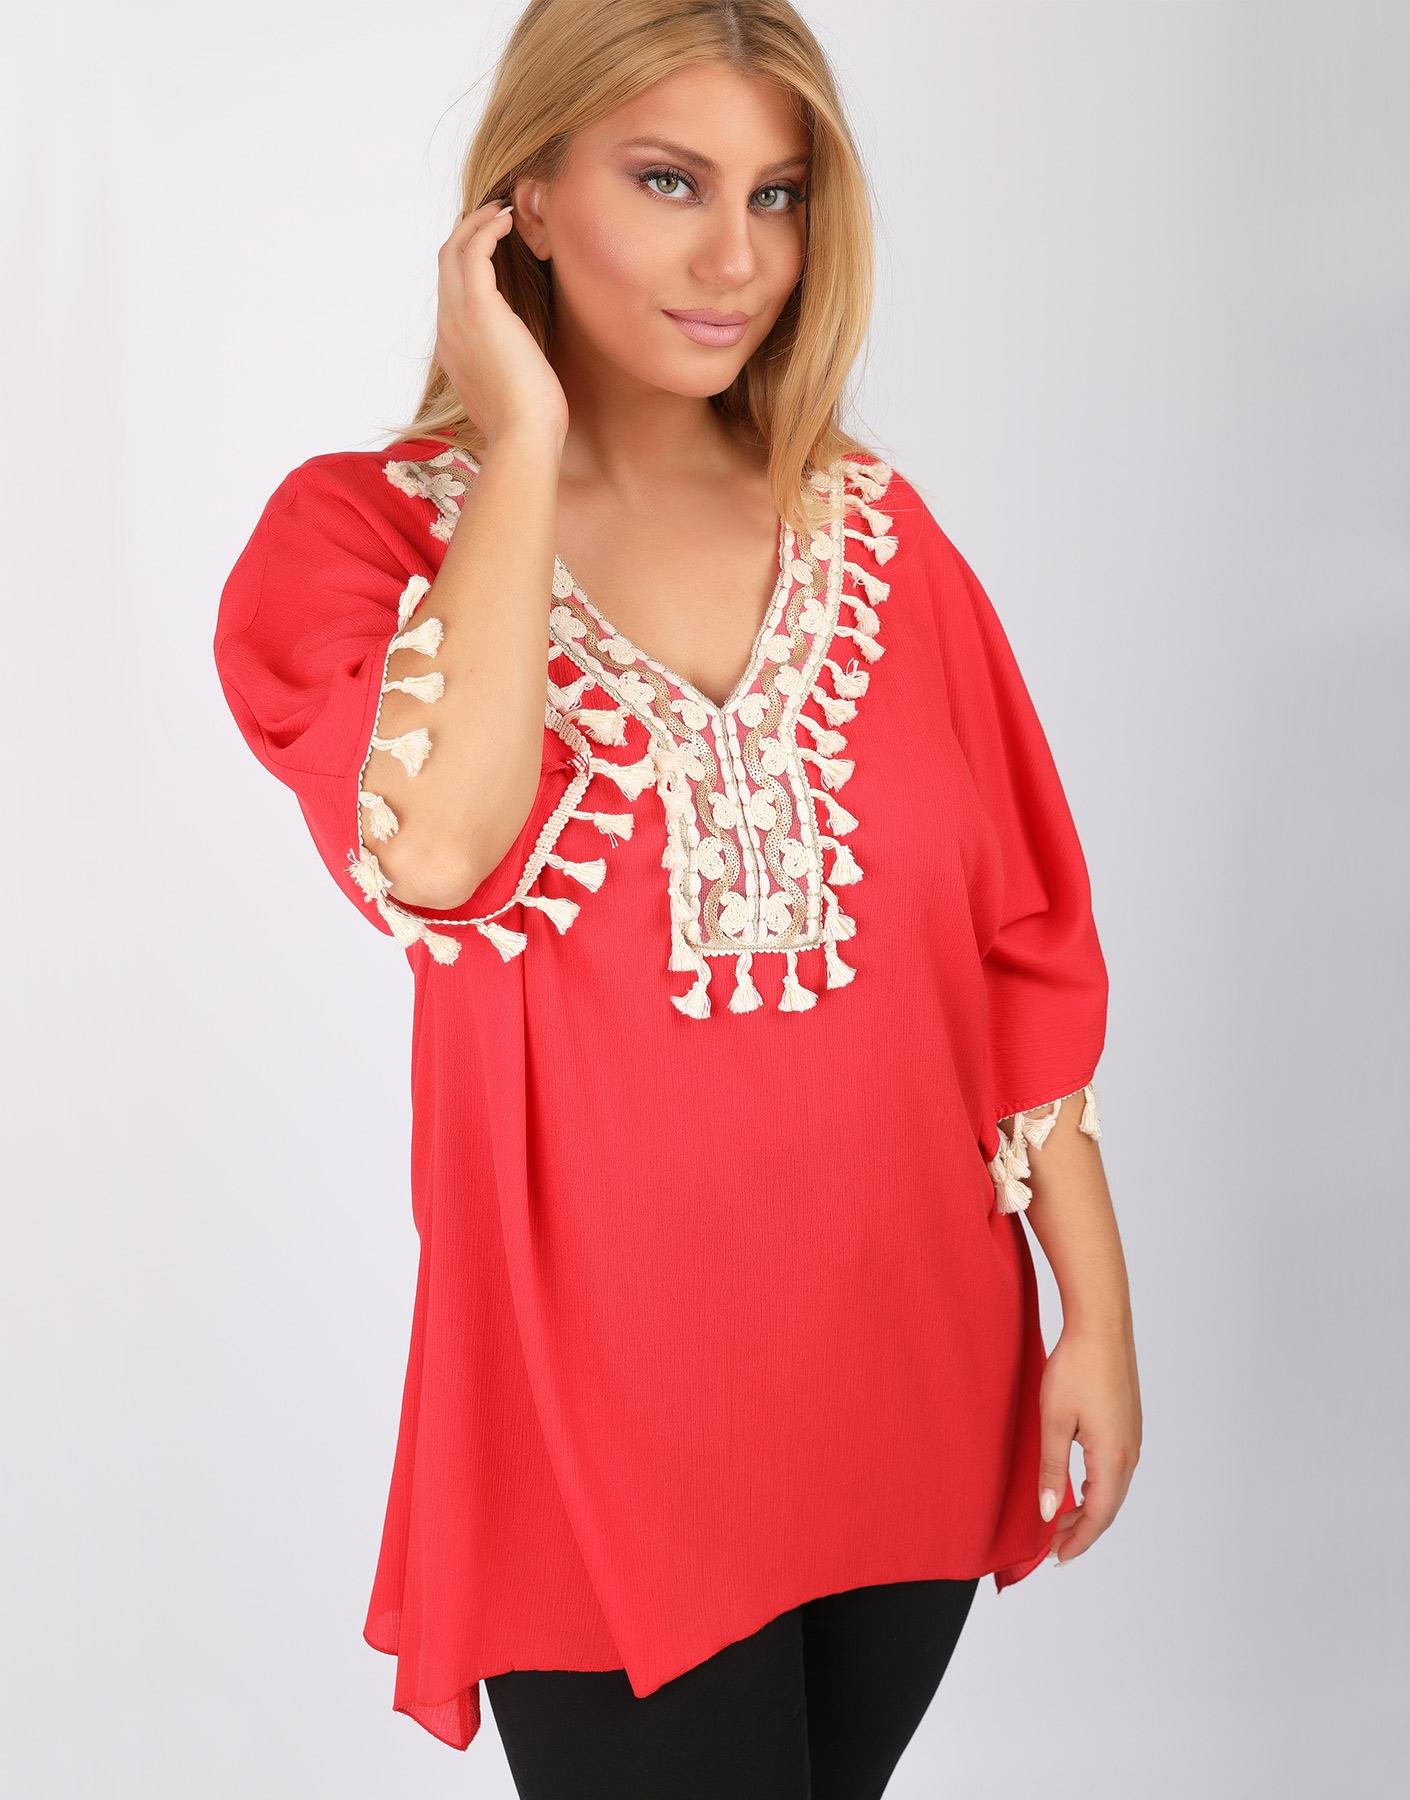 Ethnic μπλούζα με φουντάκια